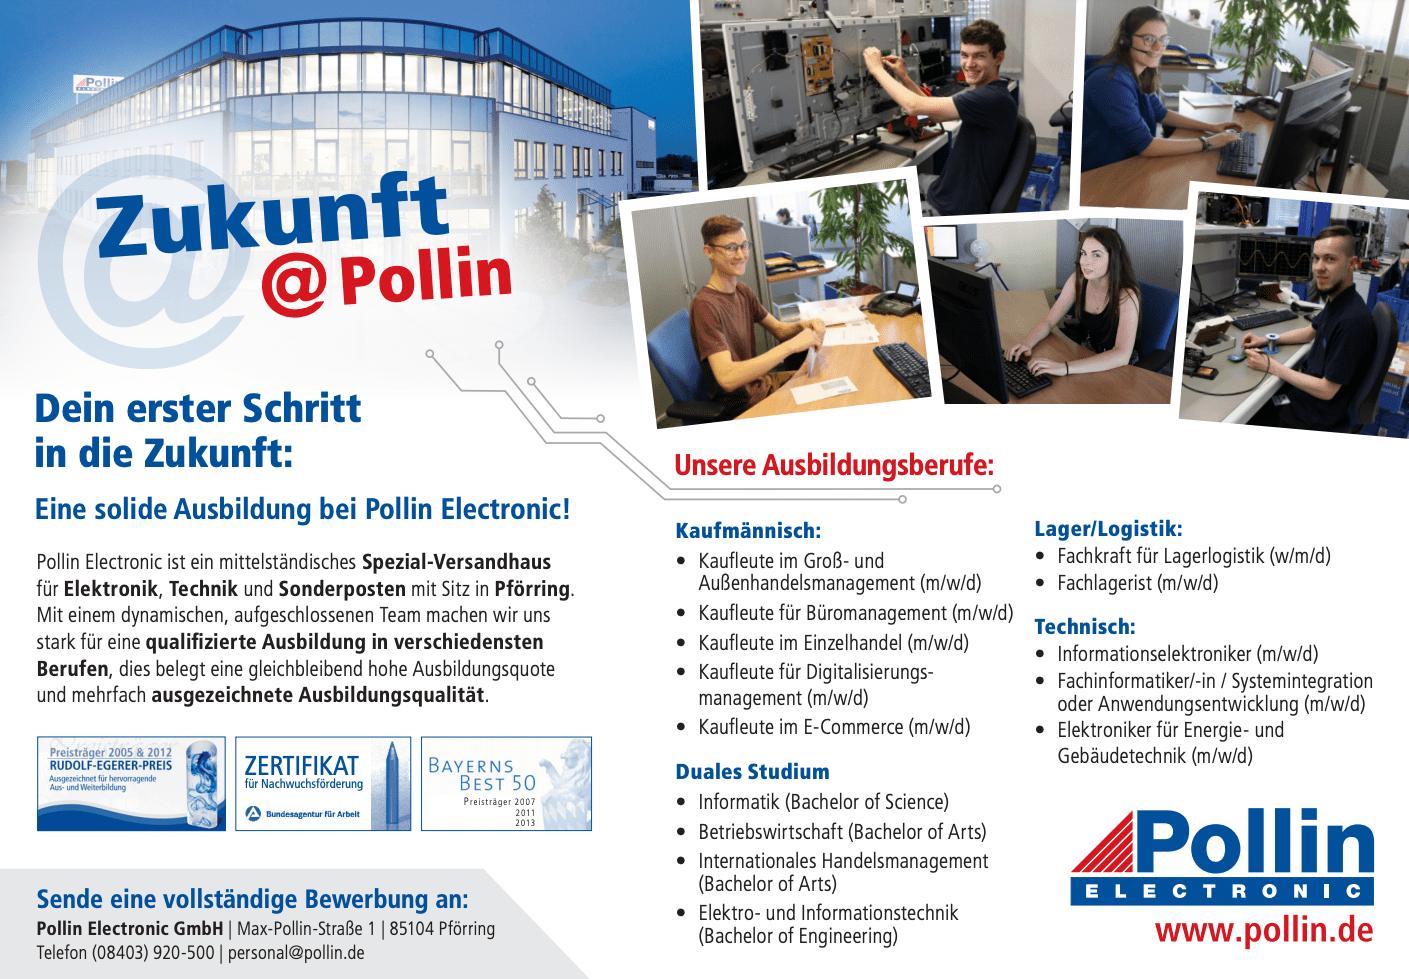 Zukunft Pollin